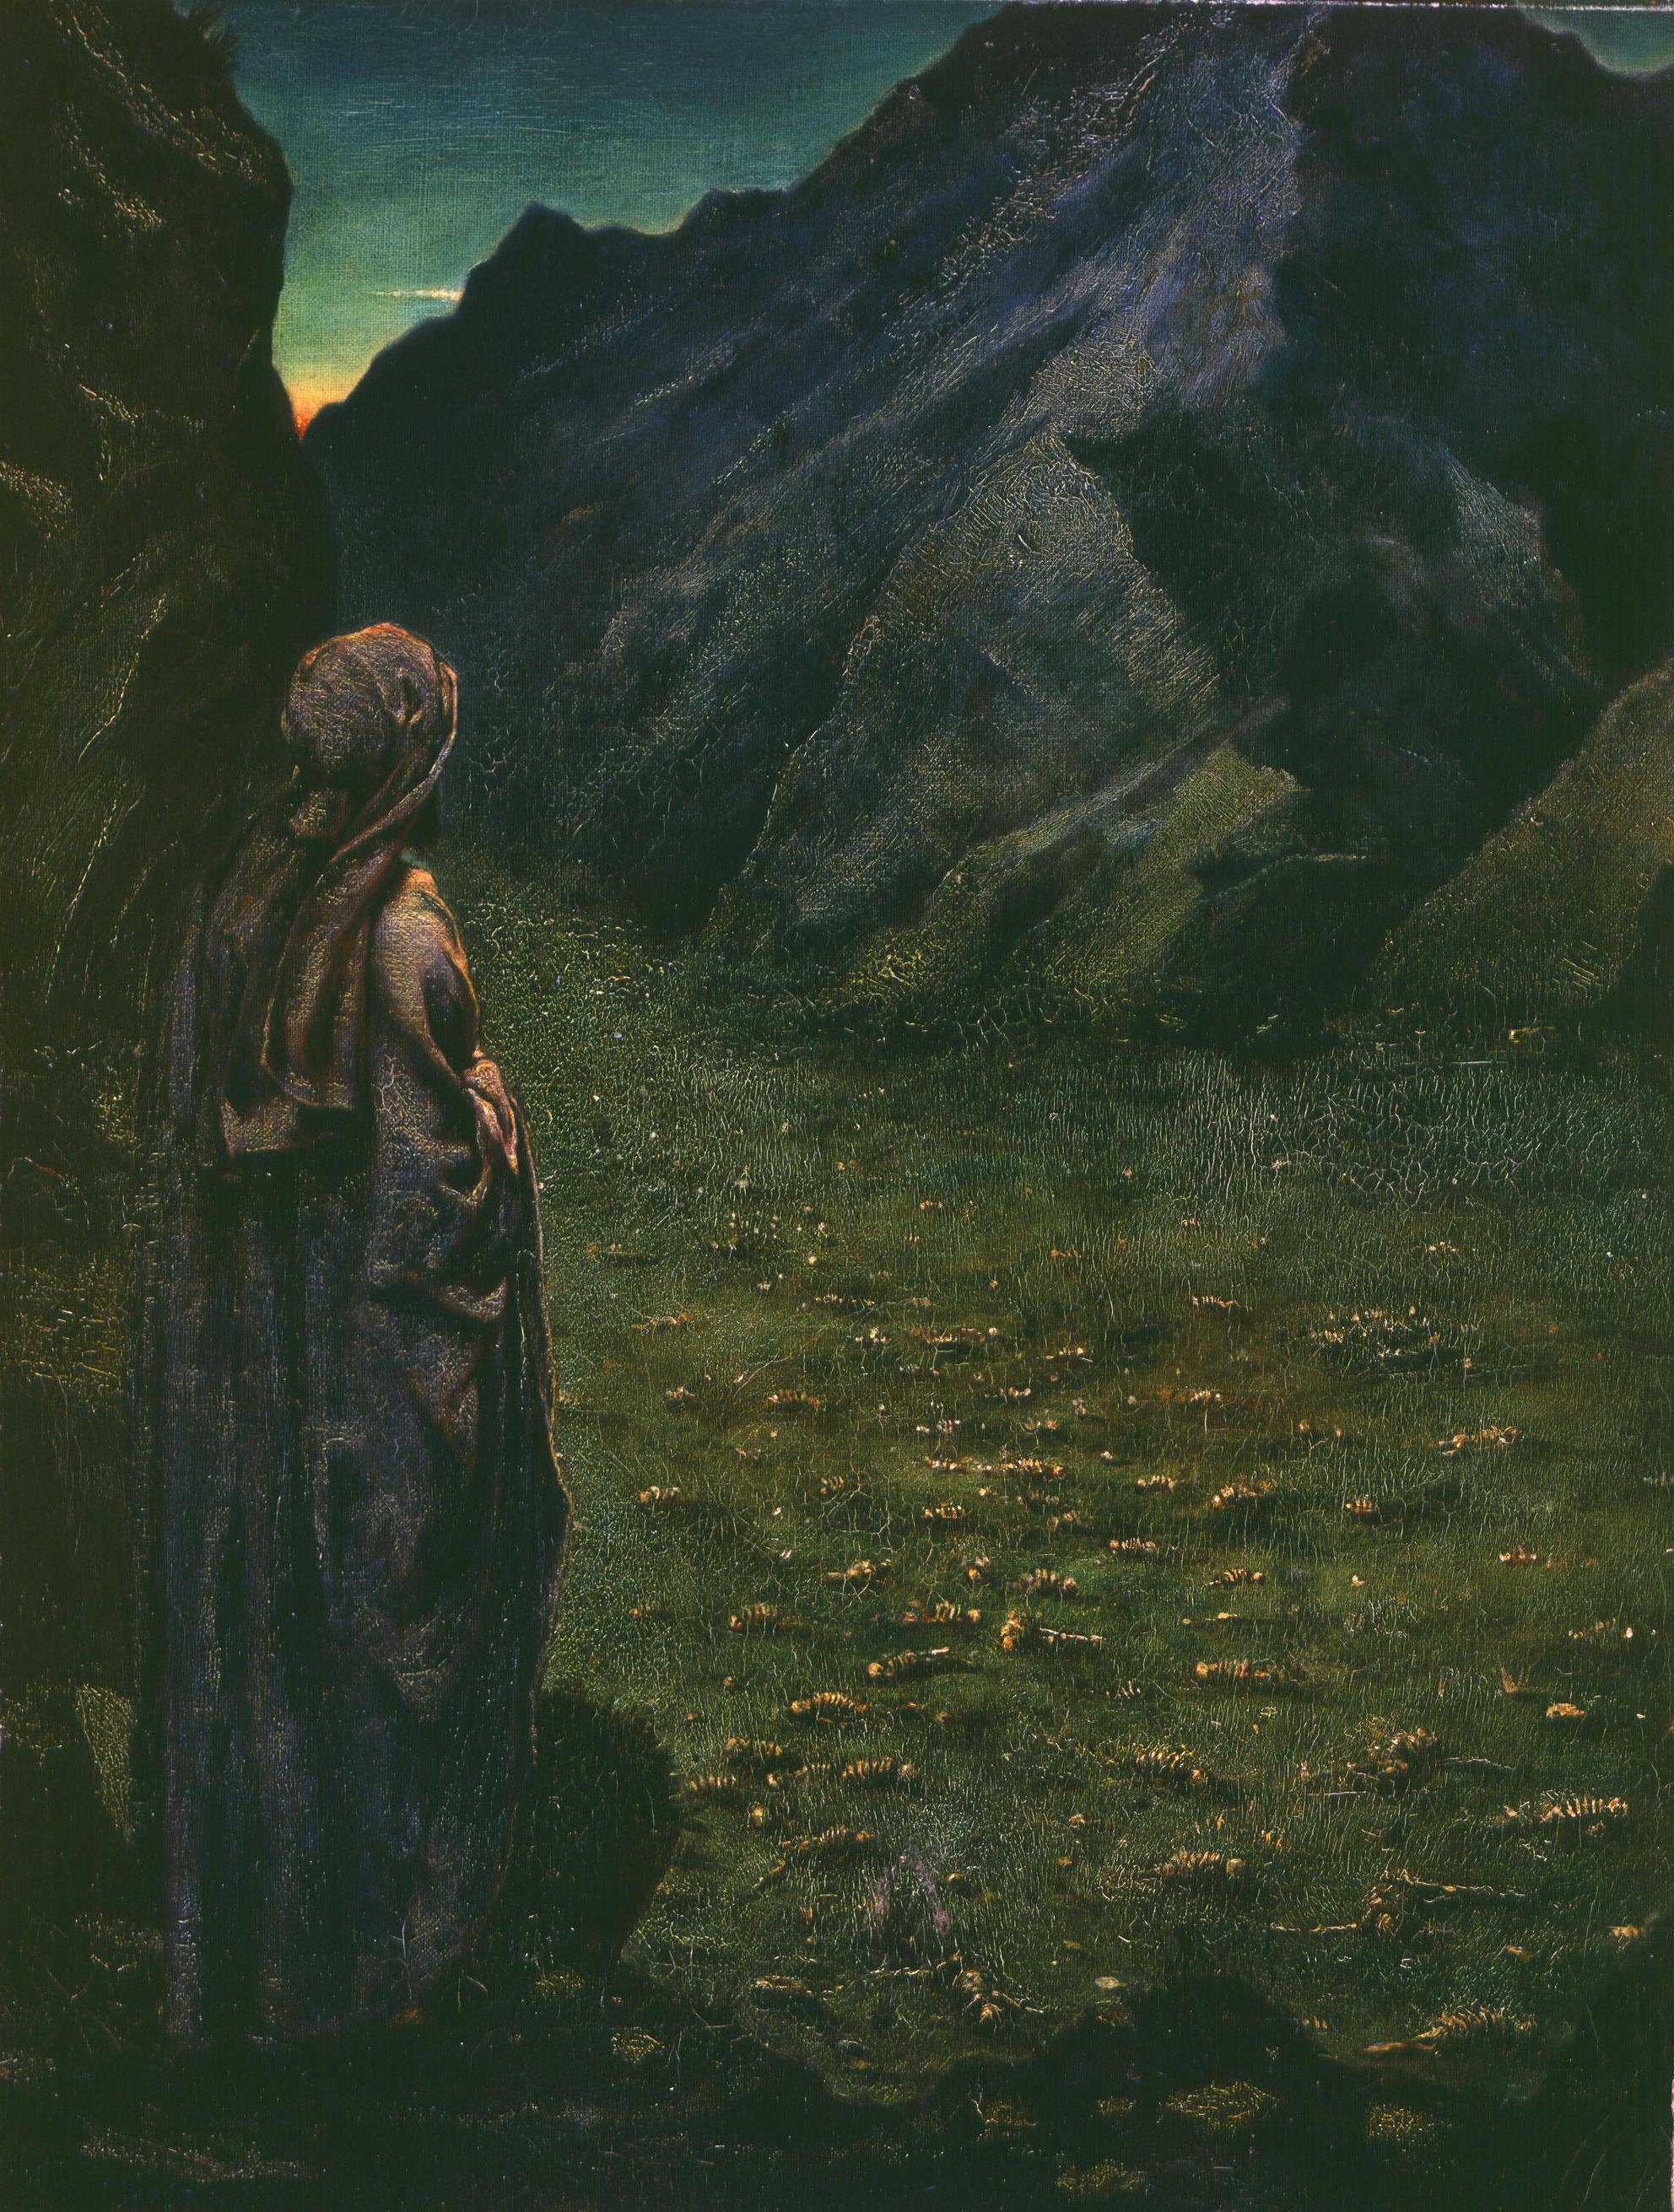 SIR PHILIP BURNE-JONES, BT.   (British, 1861 – 1926)   Ezekiel in the Valley of Dry Bones     Oil on canvas  23 x 18 inches (58.4 x 45.7 cm)